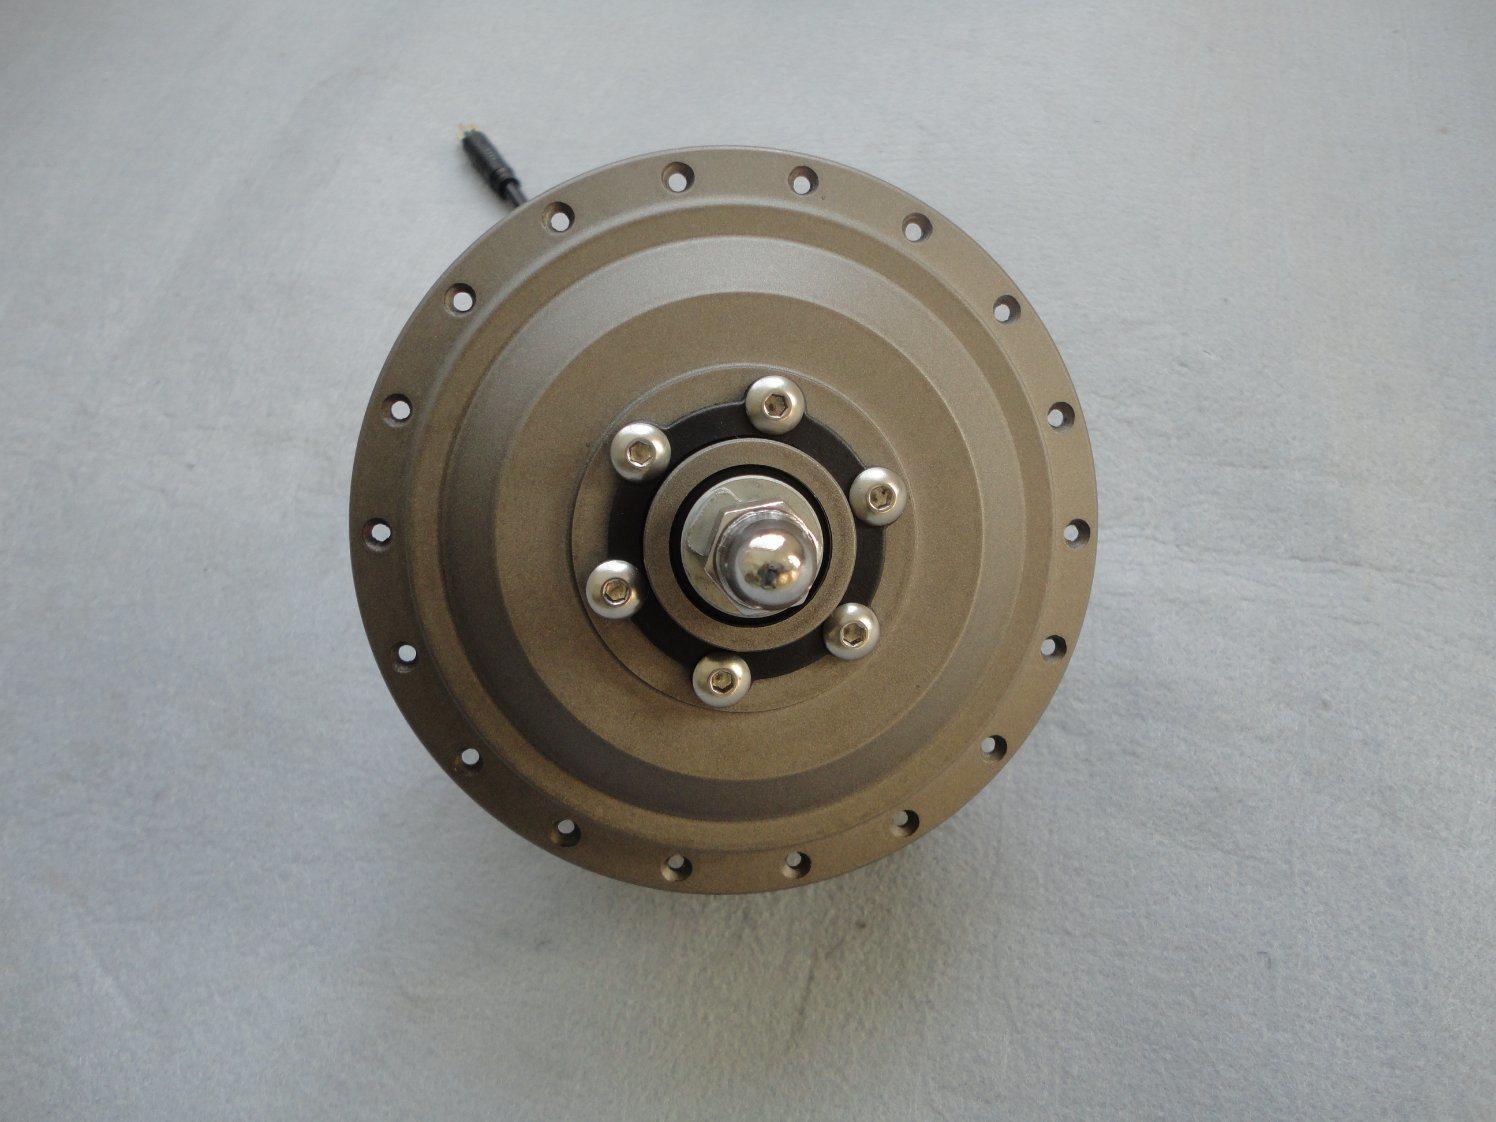 36V 500W Electric Bicycle Wheel Brushless Hub Front Motor